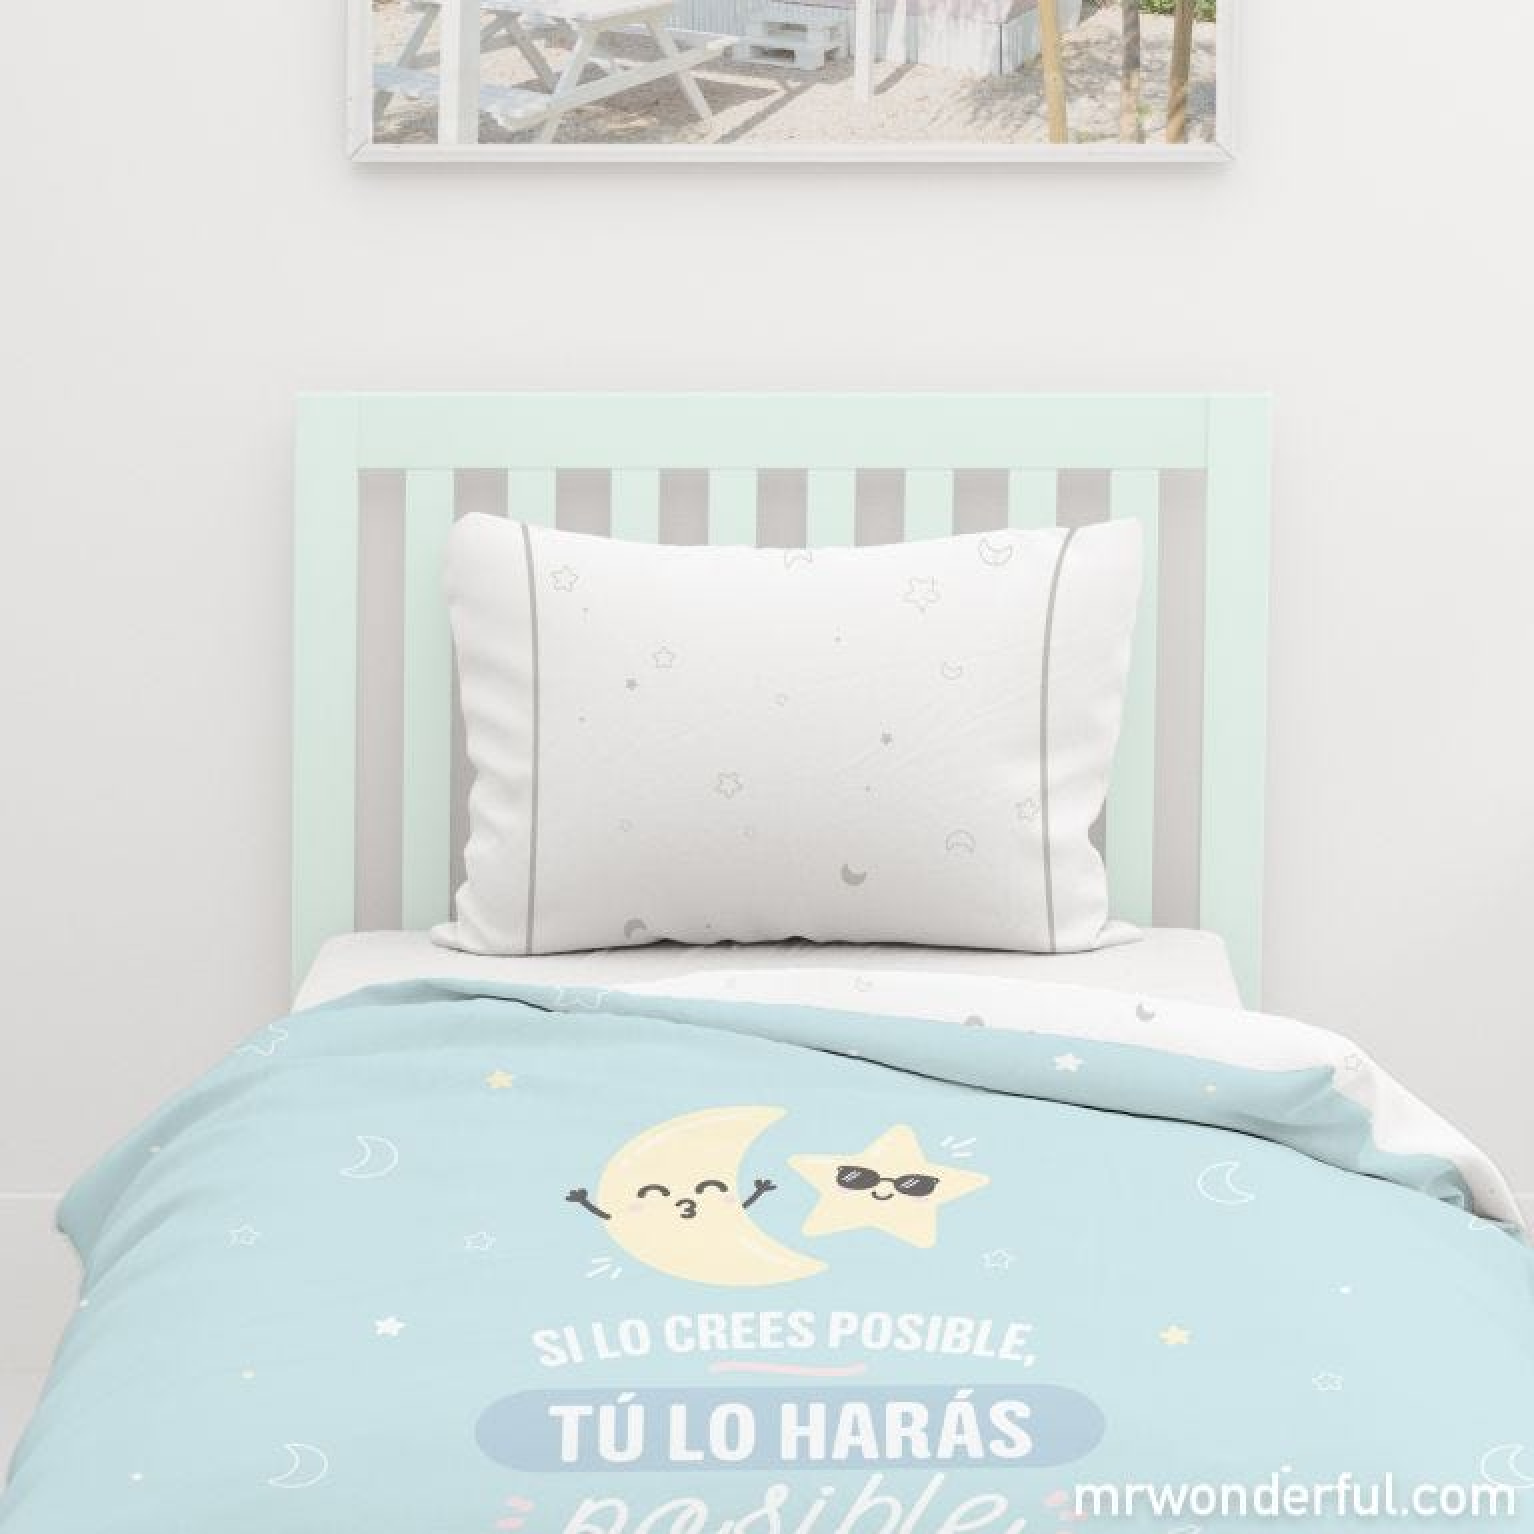 Funda nórdica cama de 90 - Siestas & Fiestas